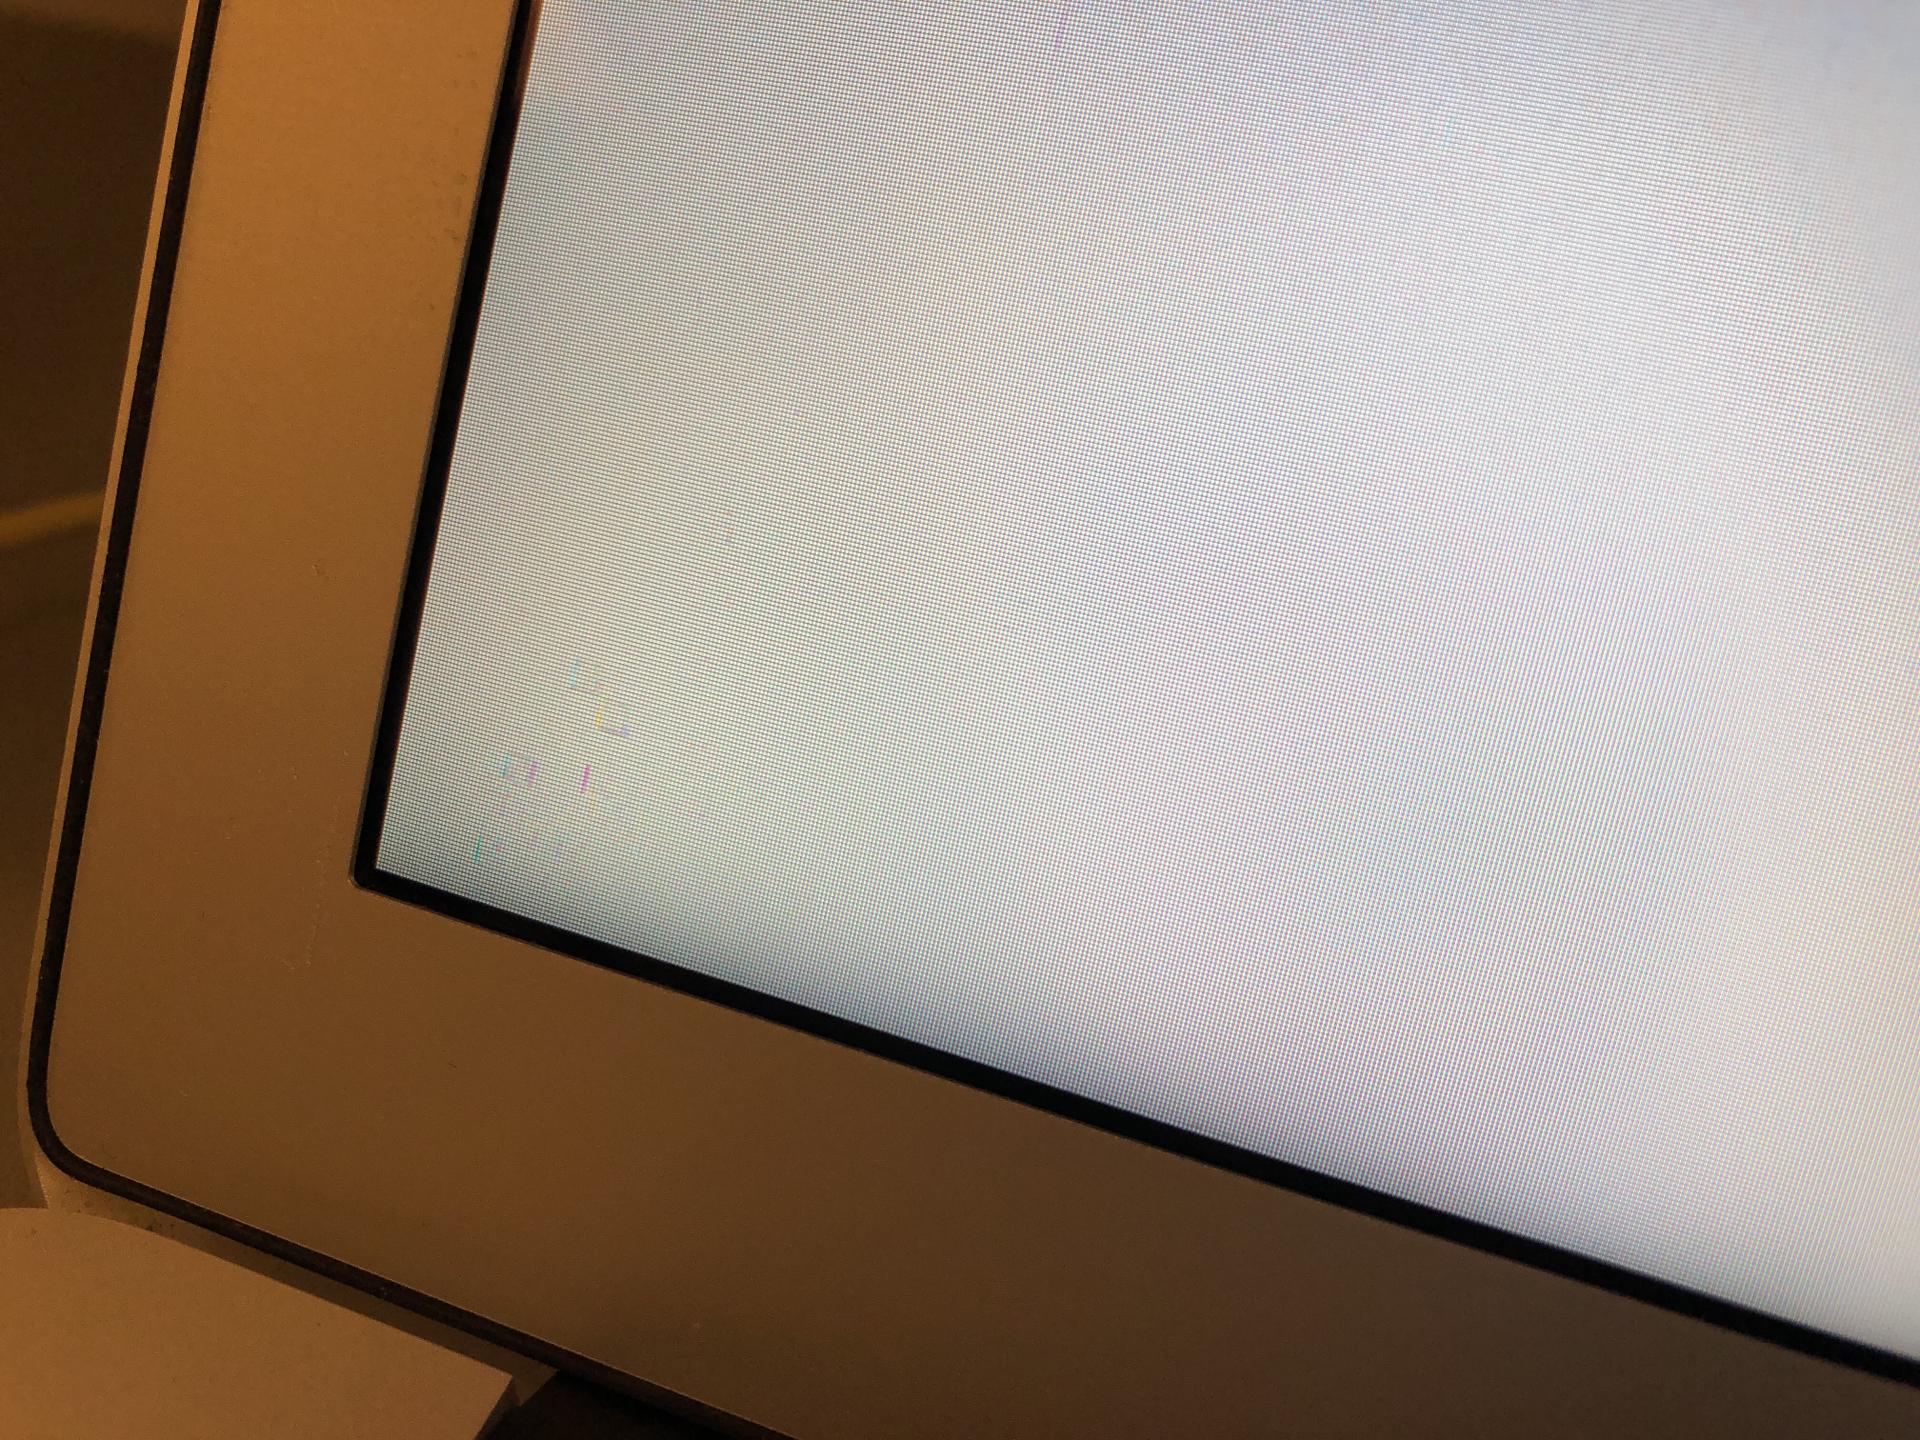 "MacBook Air 13"" Early 2015 (Intel Core i5 1.6 GHz 8 GB RAM 256 GB SSD), Intel Core i5 1.6 GHz, 8 GB RAM, 256 GB SSD, image 5"